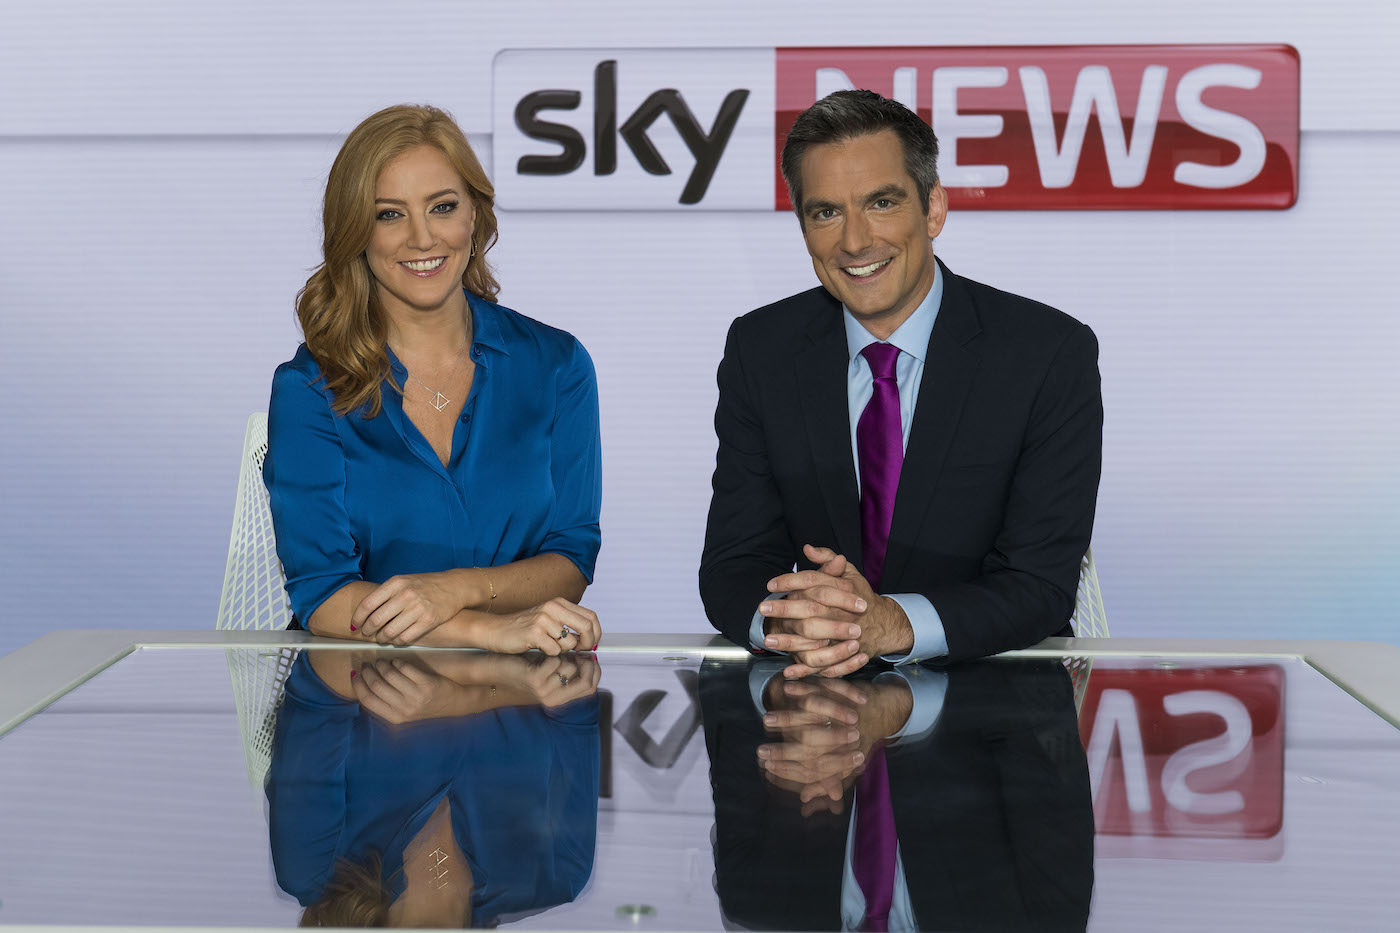 Jonathan Samuels and Sarah-Jane Mee at Sky News